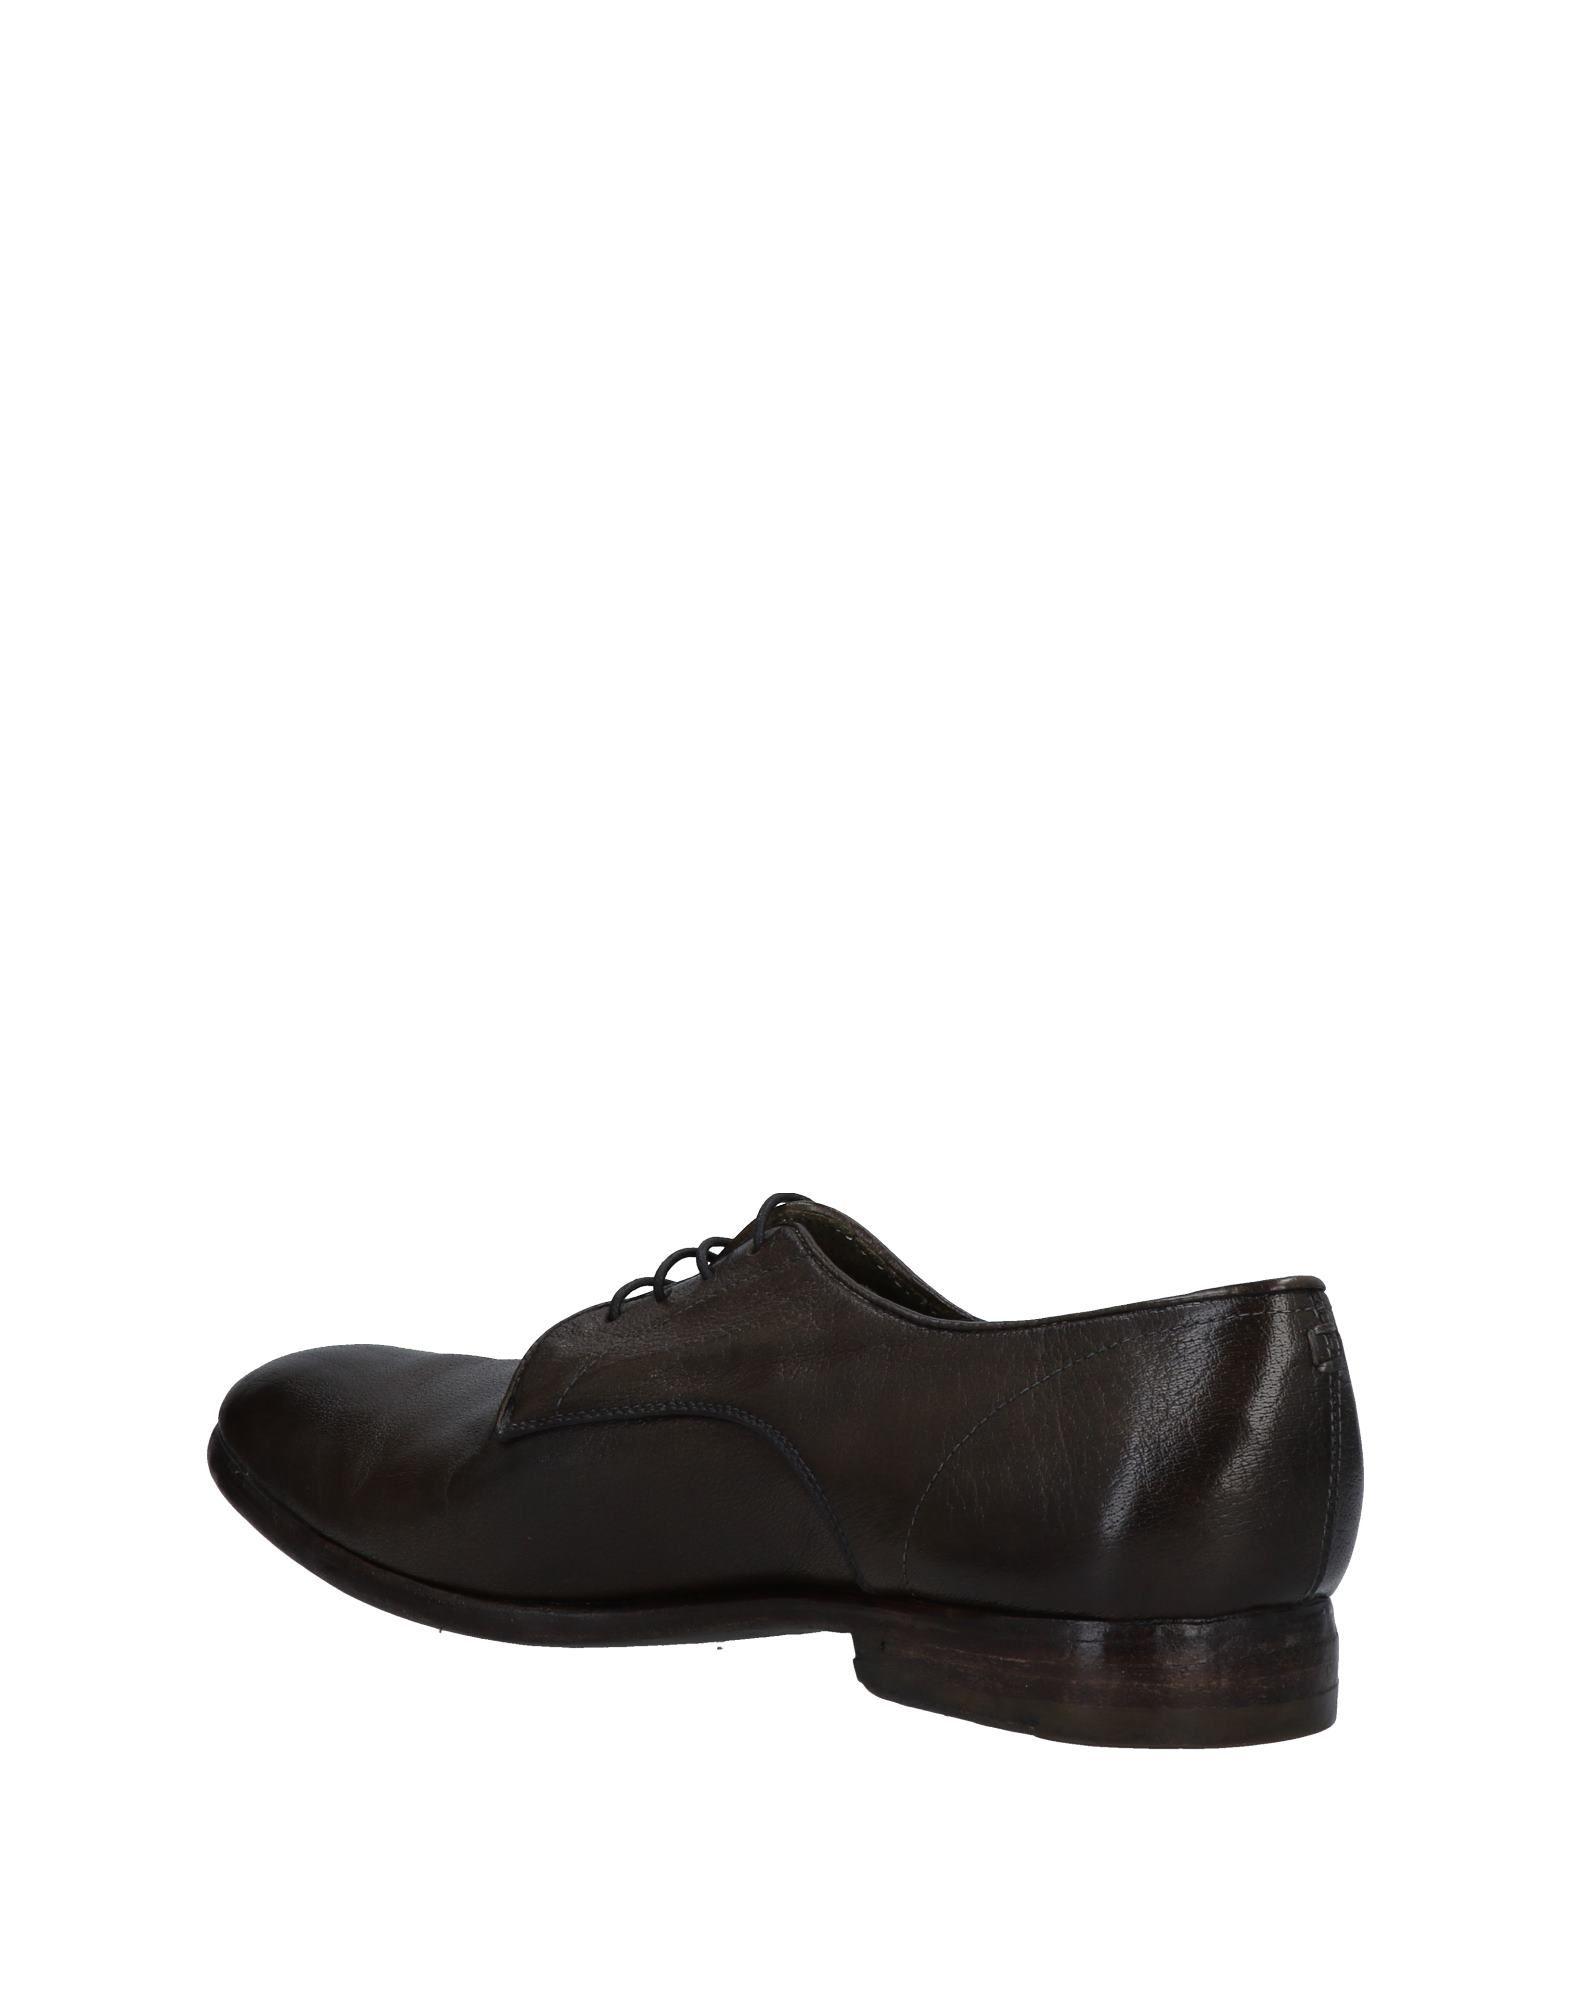 Raparo Schnürschuhe Schuhe Herren  11471334BH Heiße Schuhe Schnürschuhe 555b65